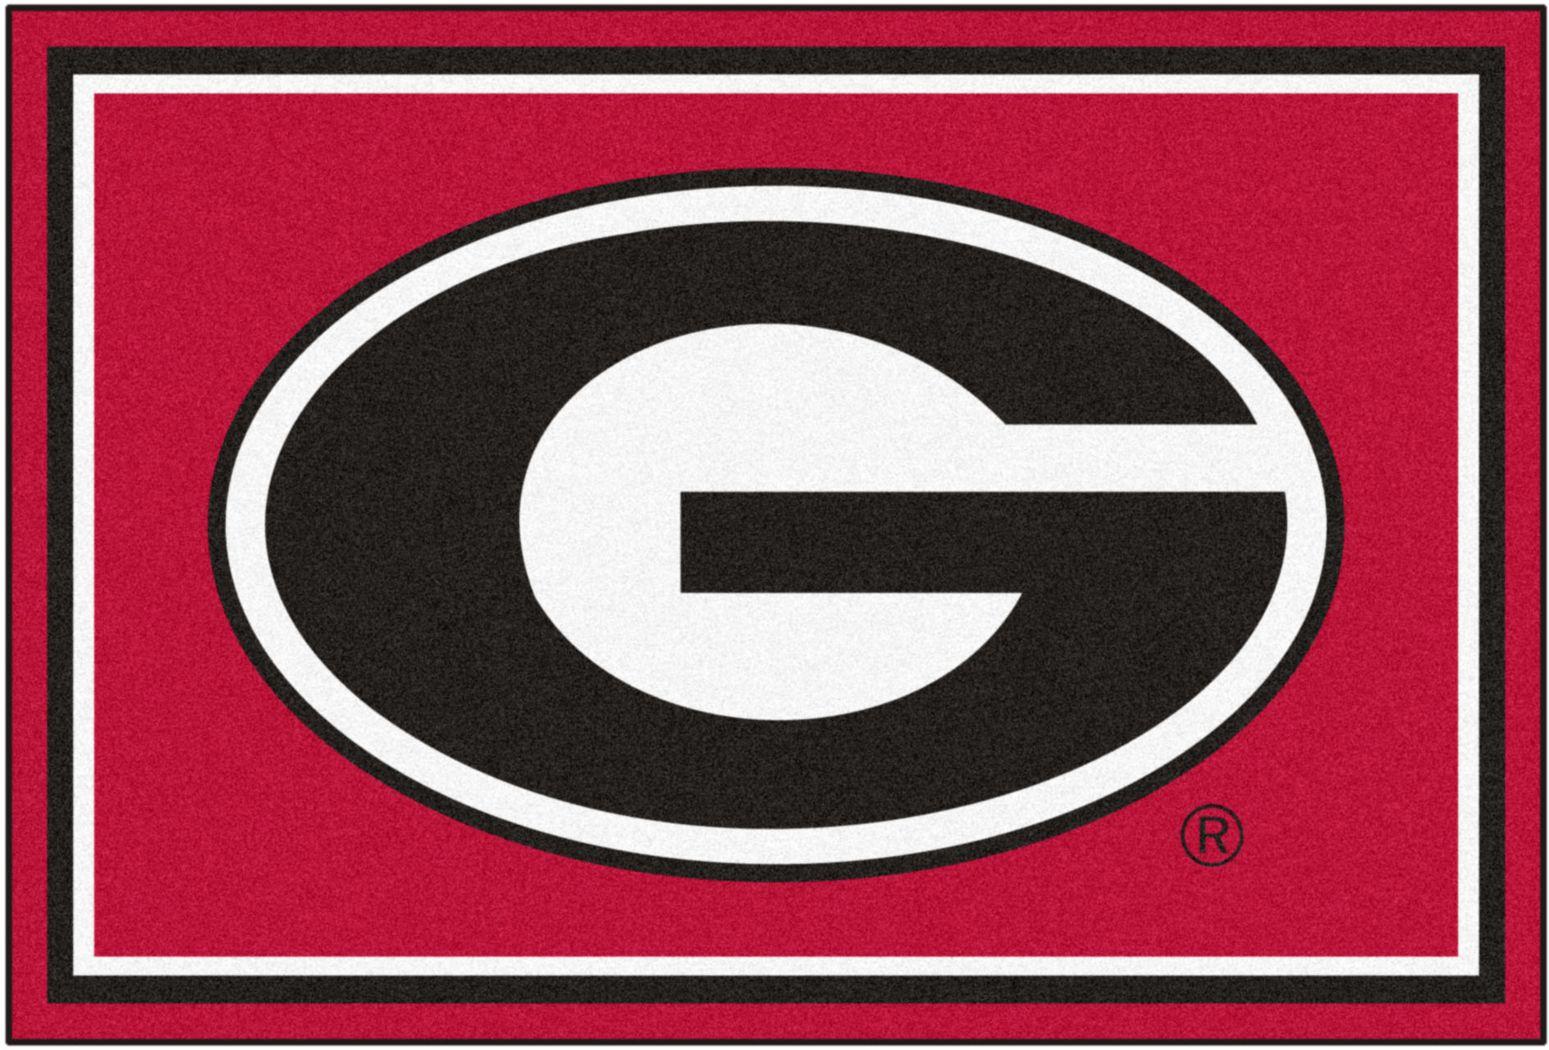 NCAA Big Game University of Georgia 5' x 8' Rug